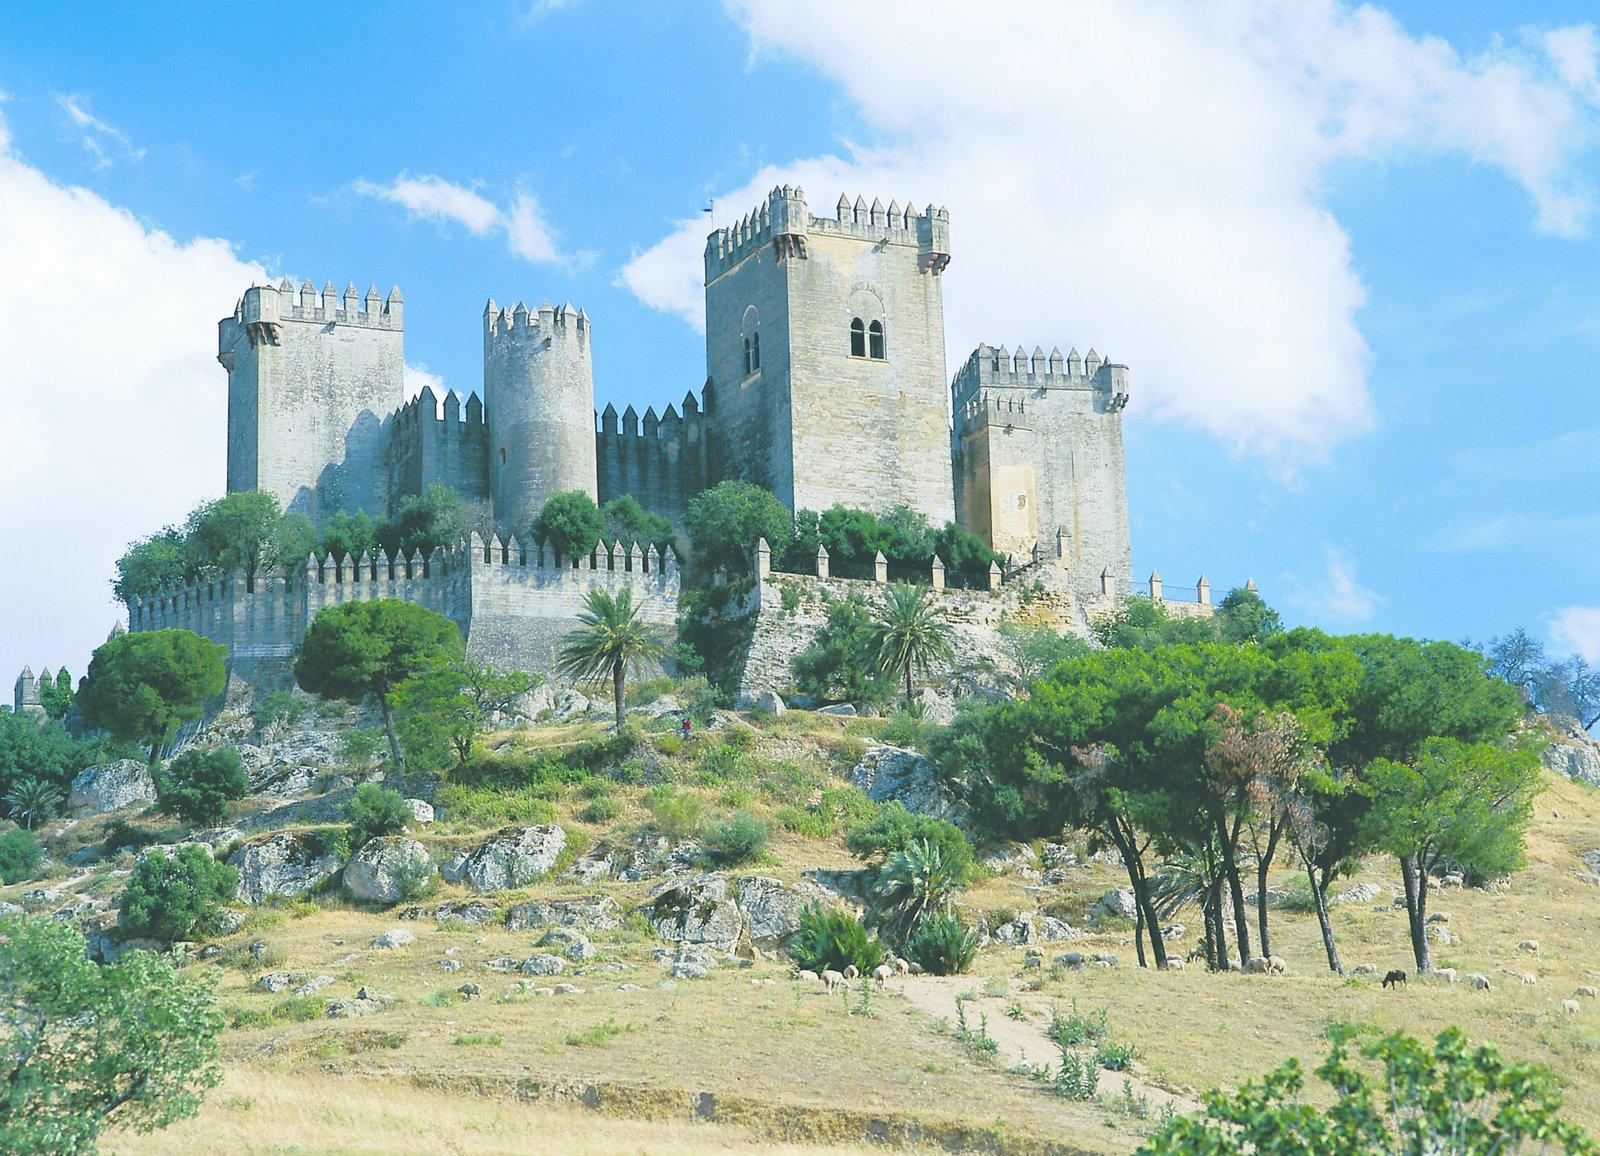 Castillo de Almodóvar del Río, Spain (Casterly Rock and Highgarden)